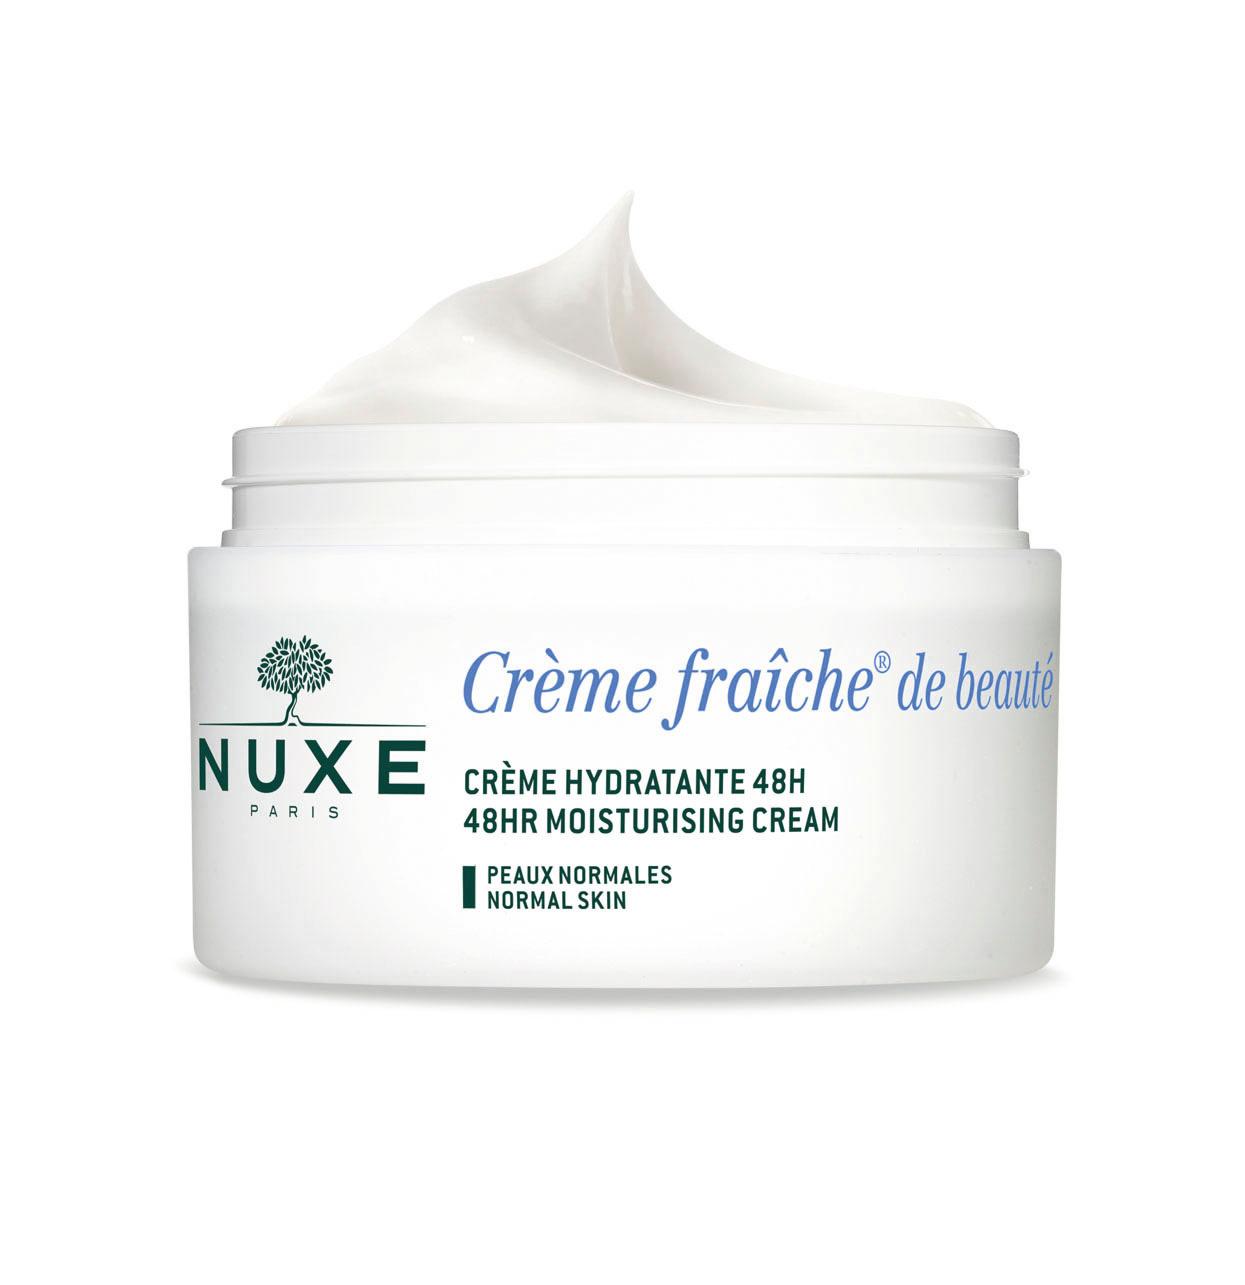 NUXE Creme Fraiche Creme Hydratante 48H